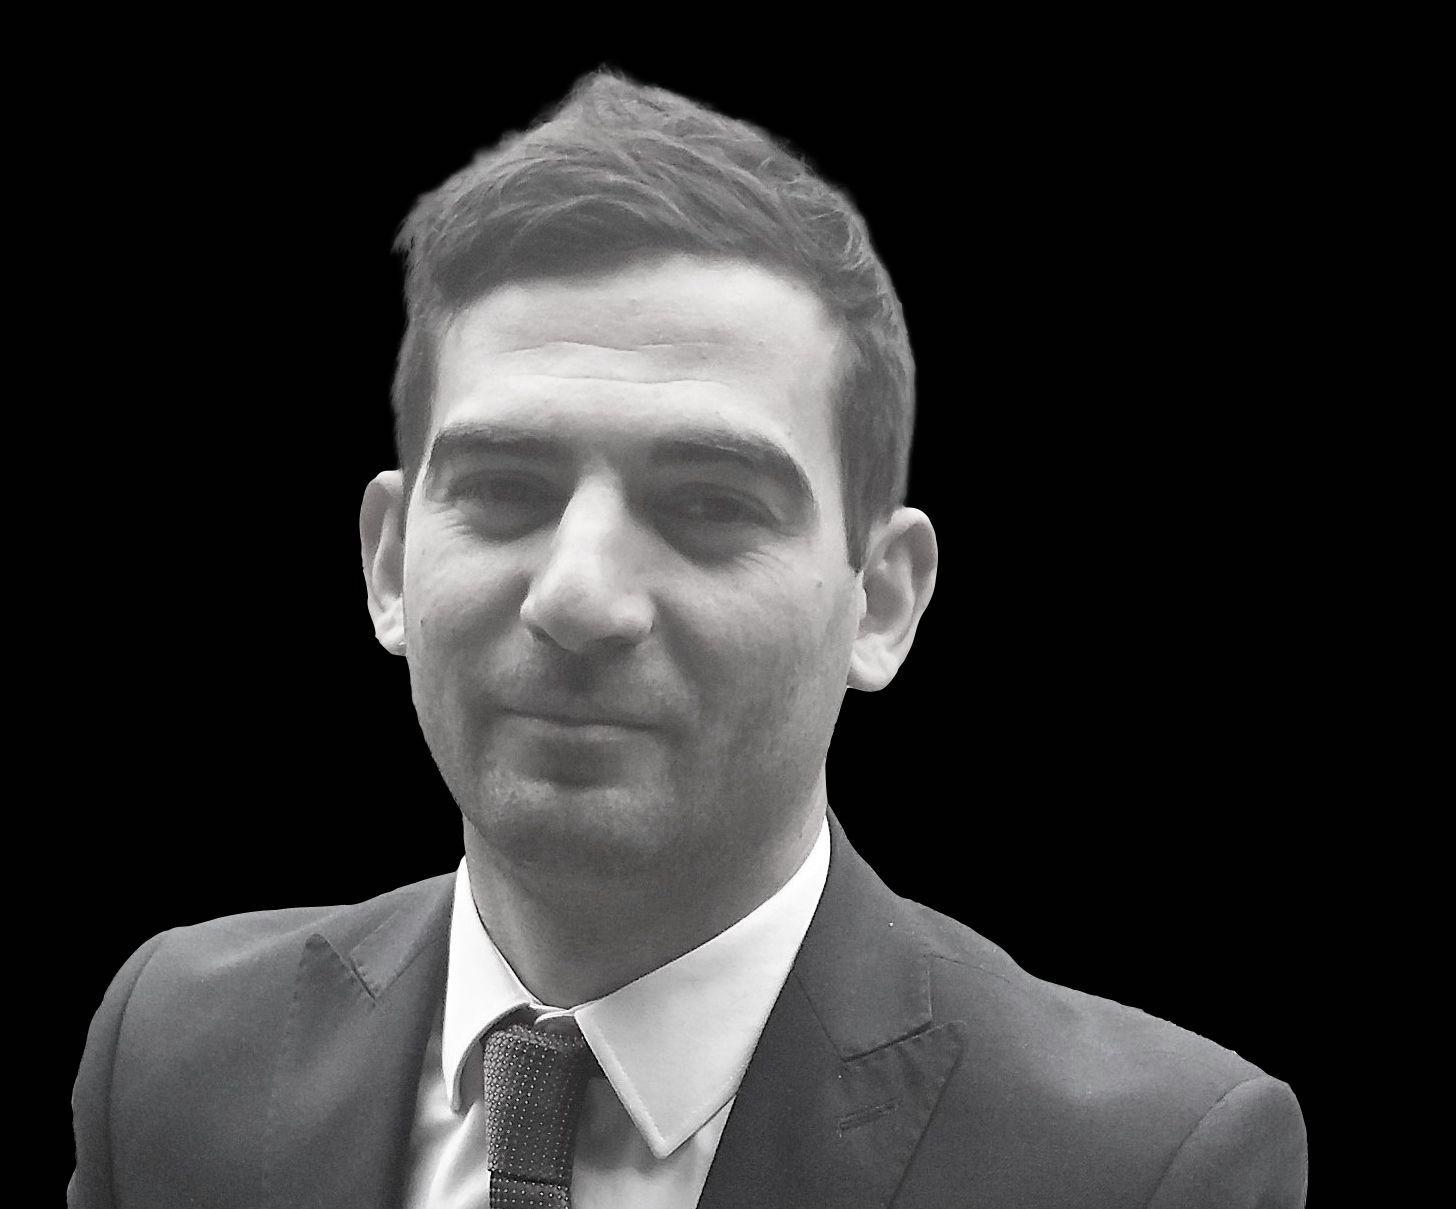 Dimitrios Syrmis